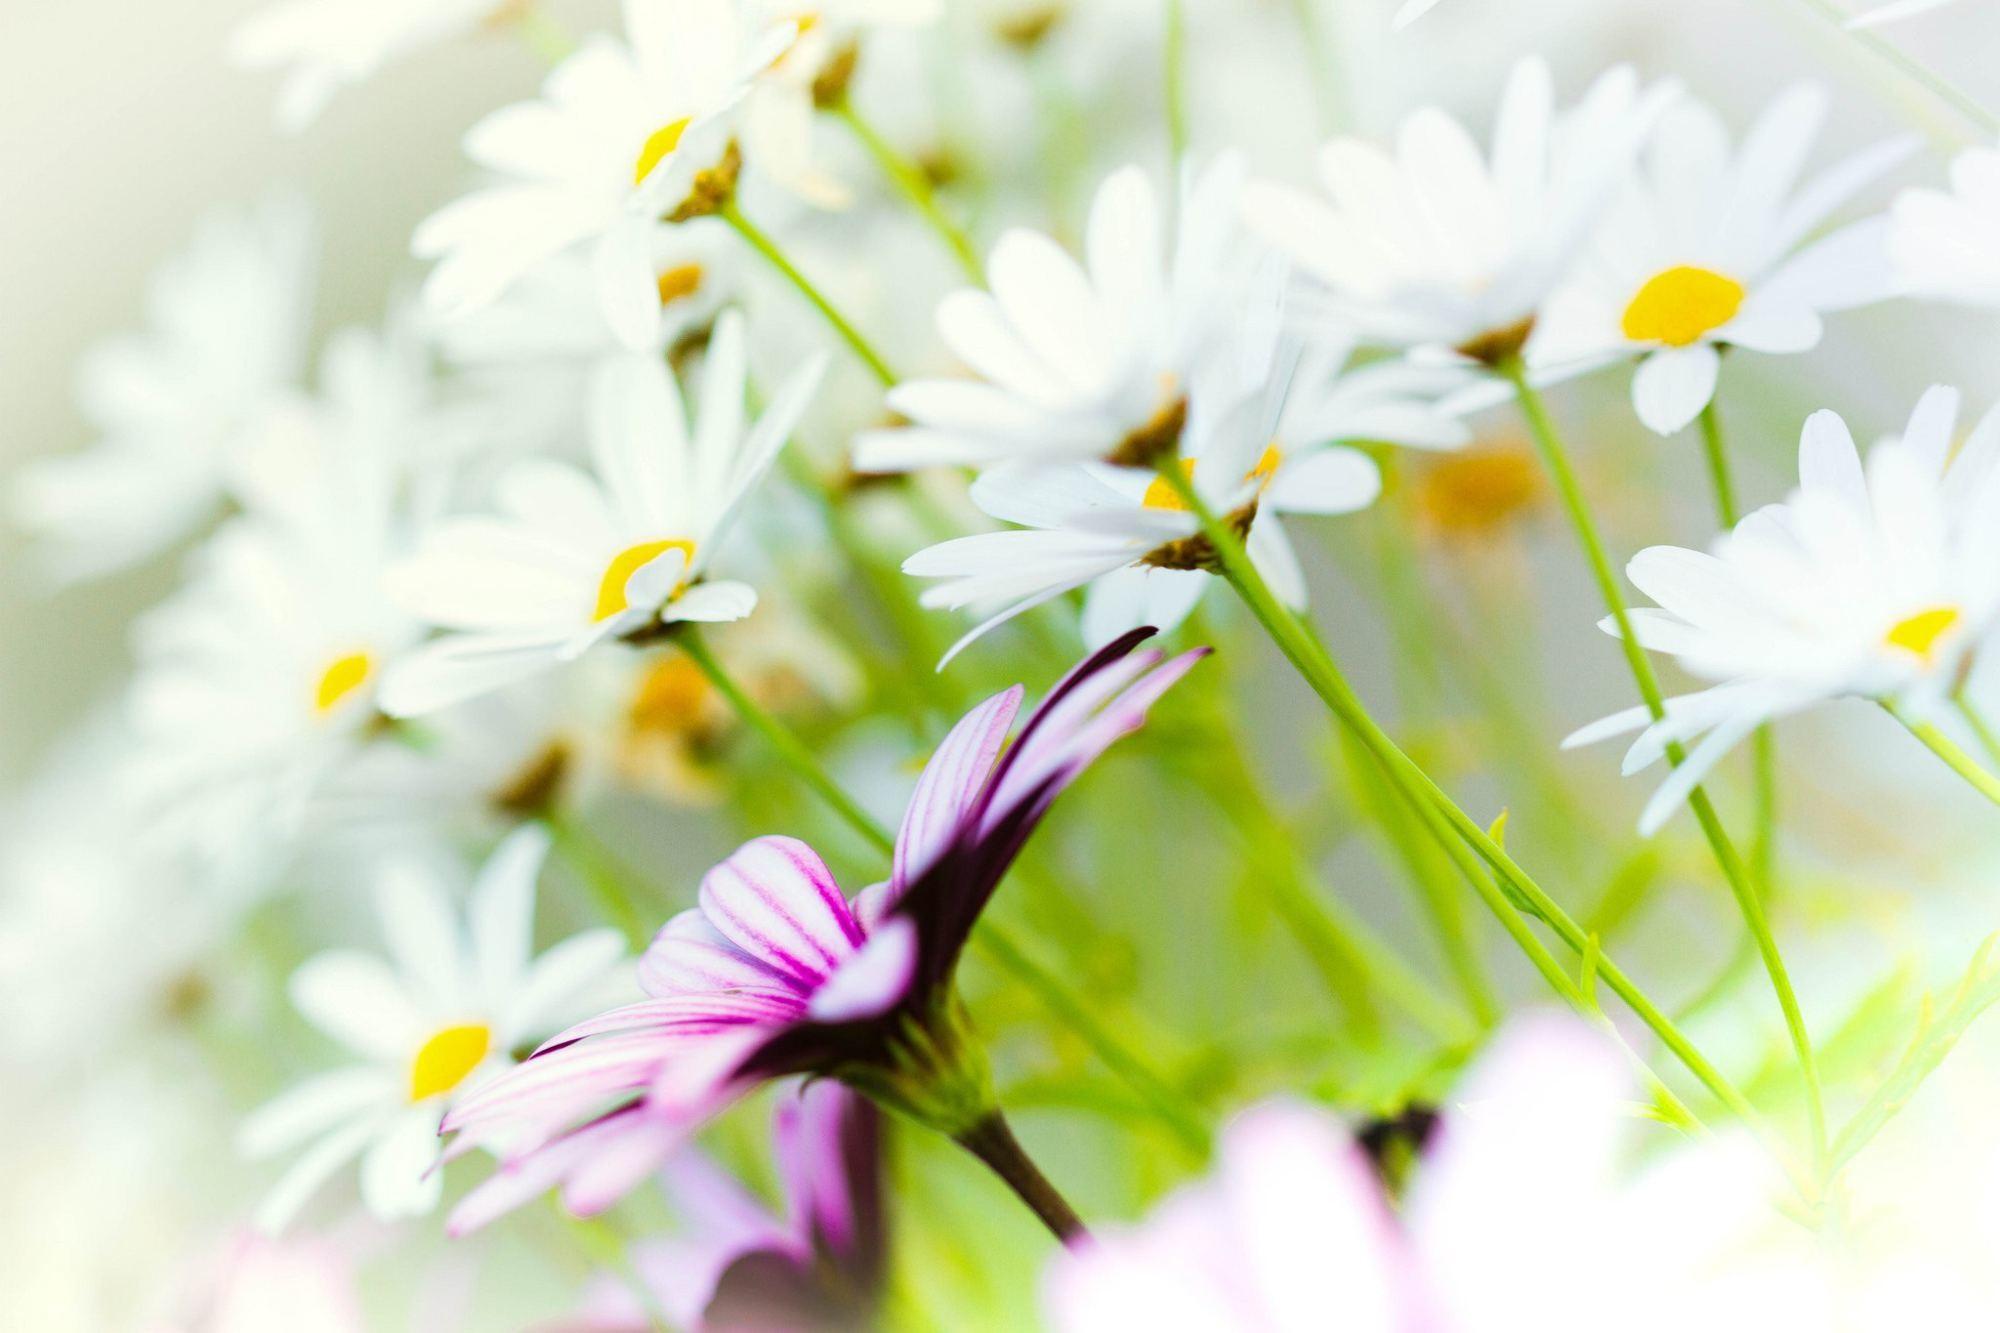 ромашки розовые белые chamomile pink white  № 1037924  скачать